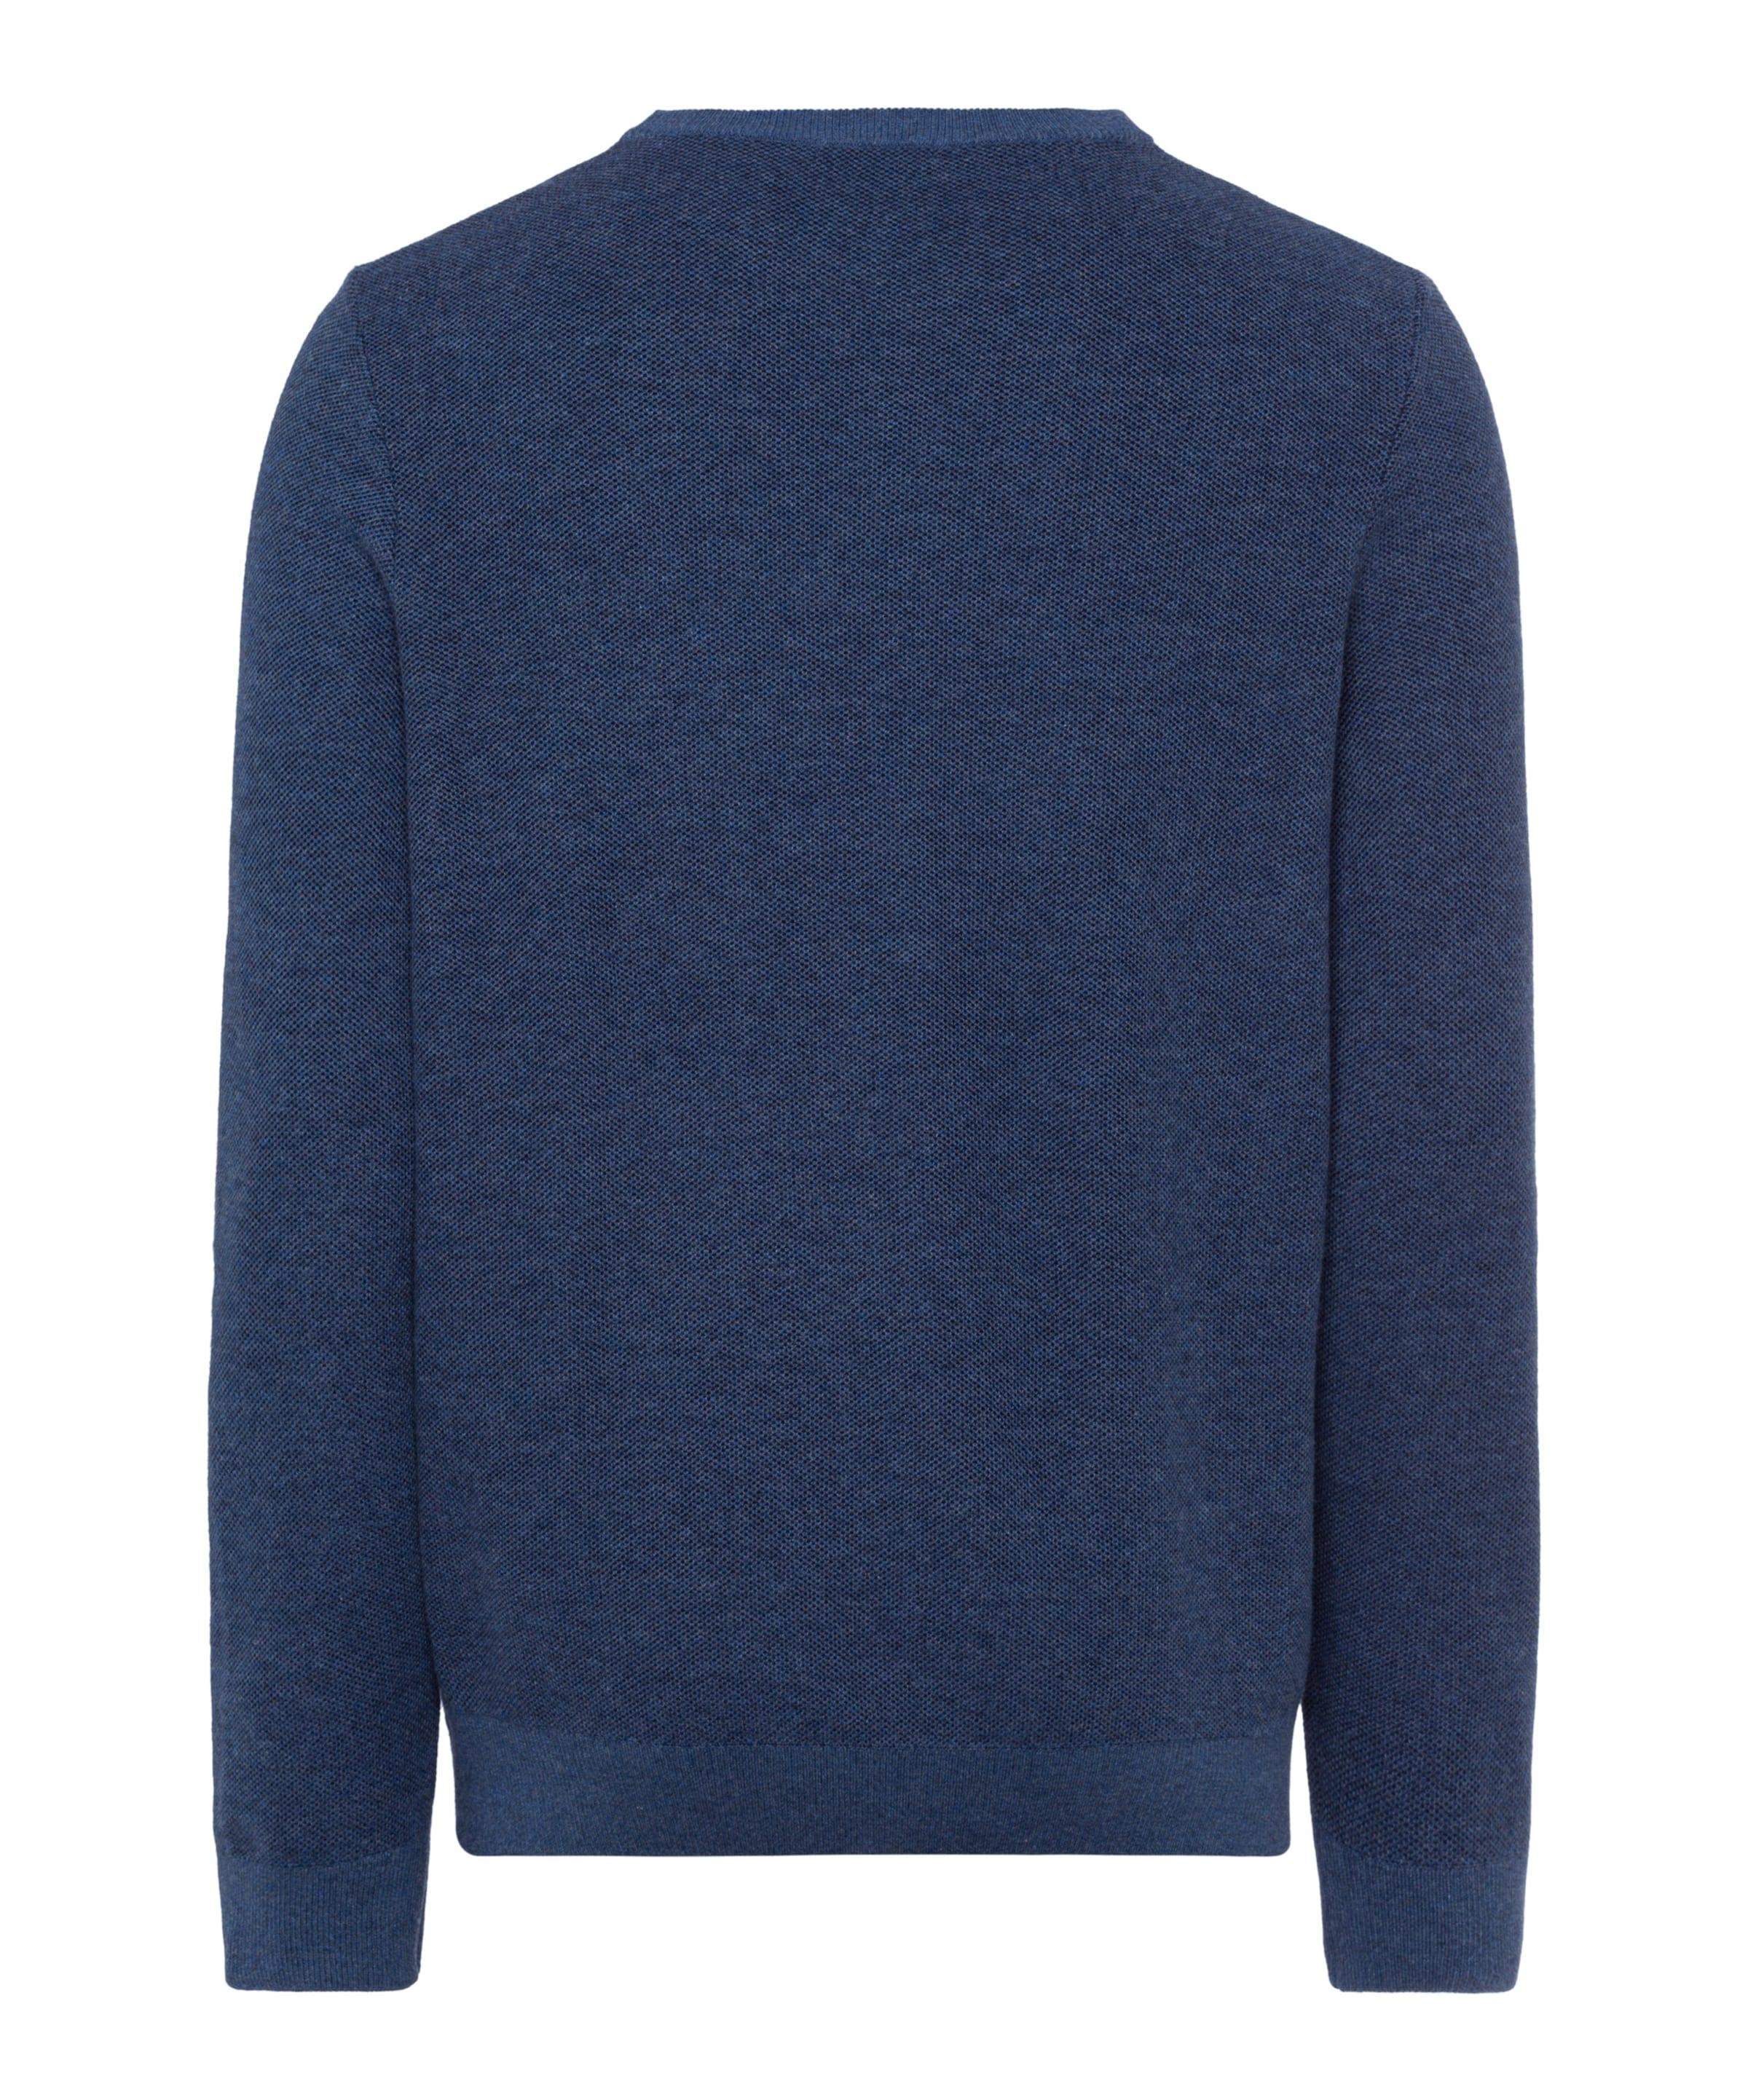 Brax Himmelblau 'rick' Brax Pullover Pullover In uPZiOXk